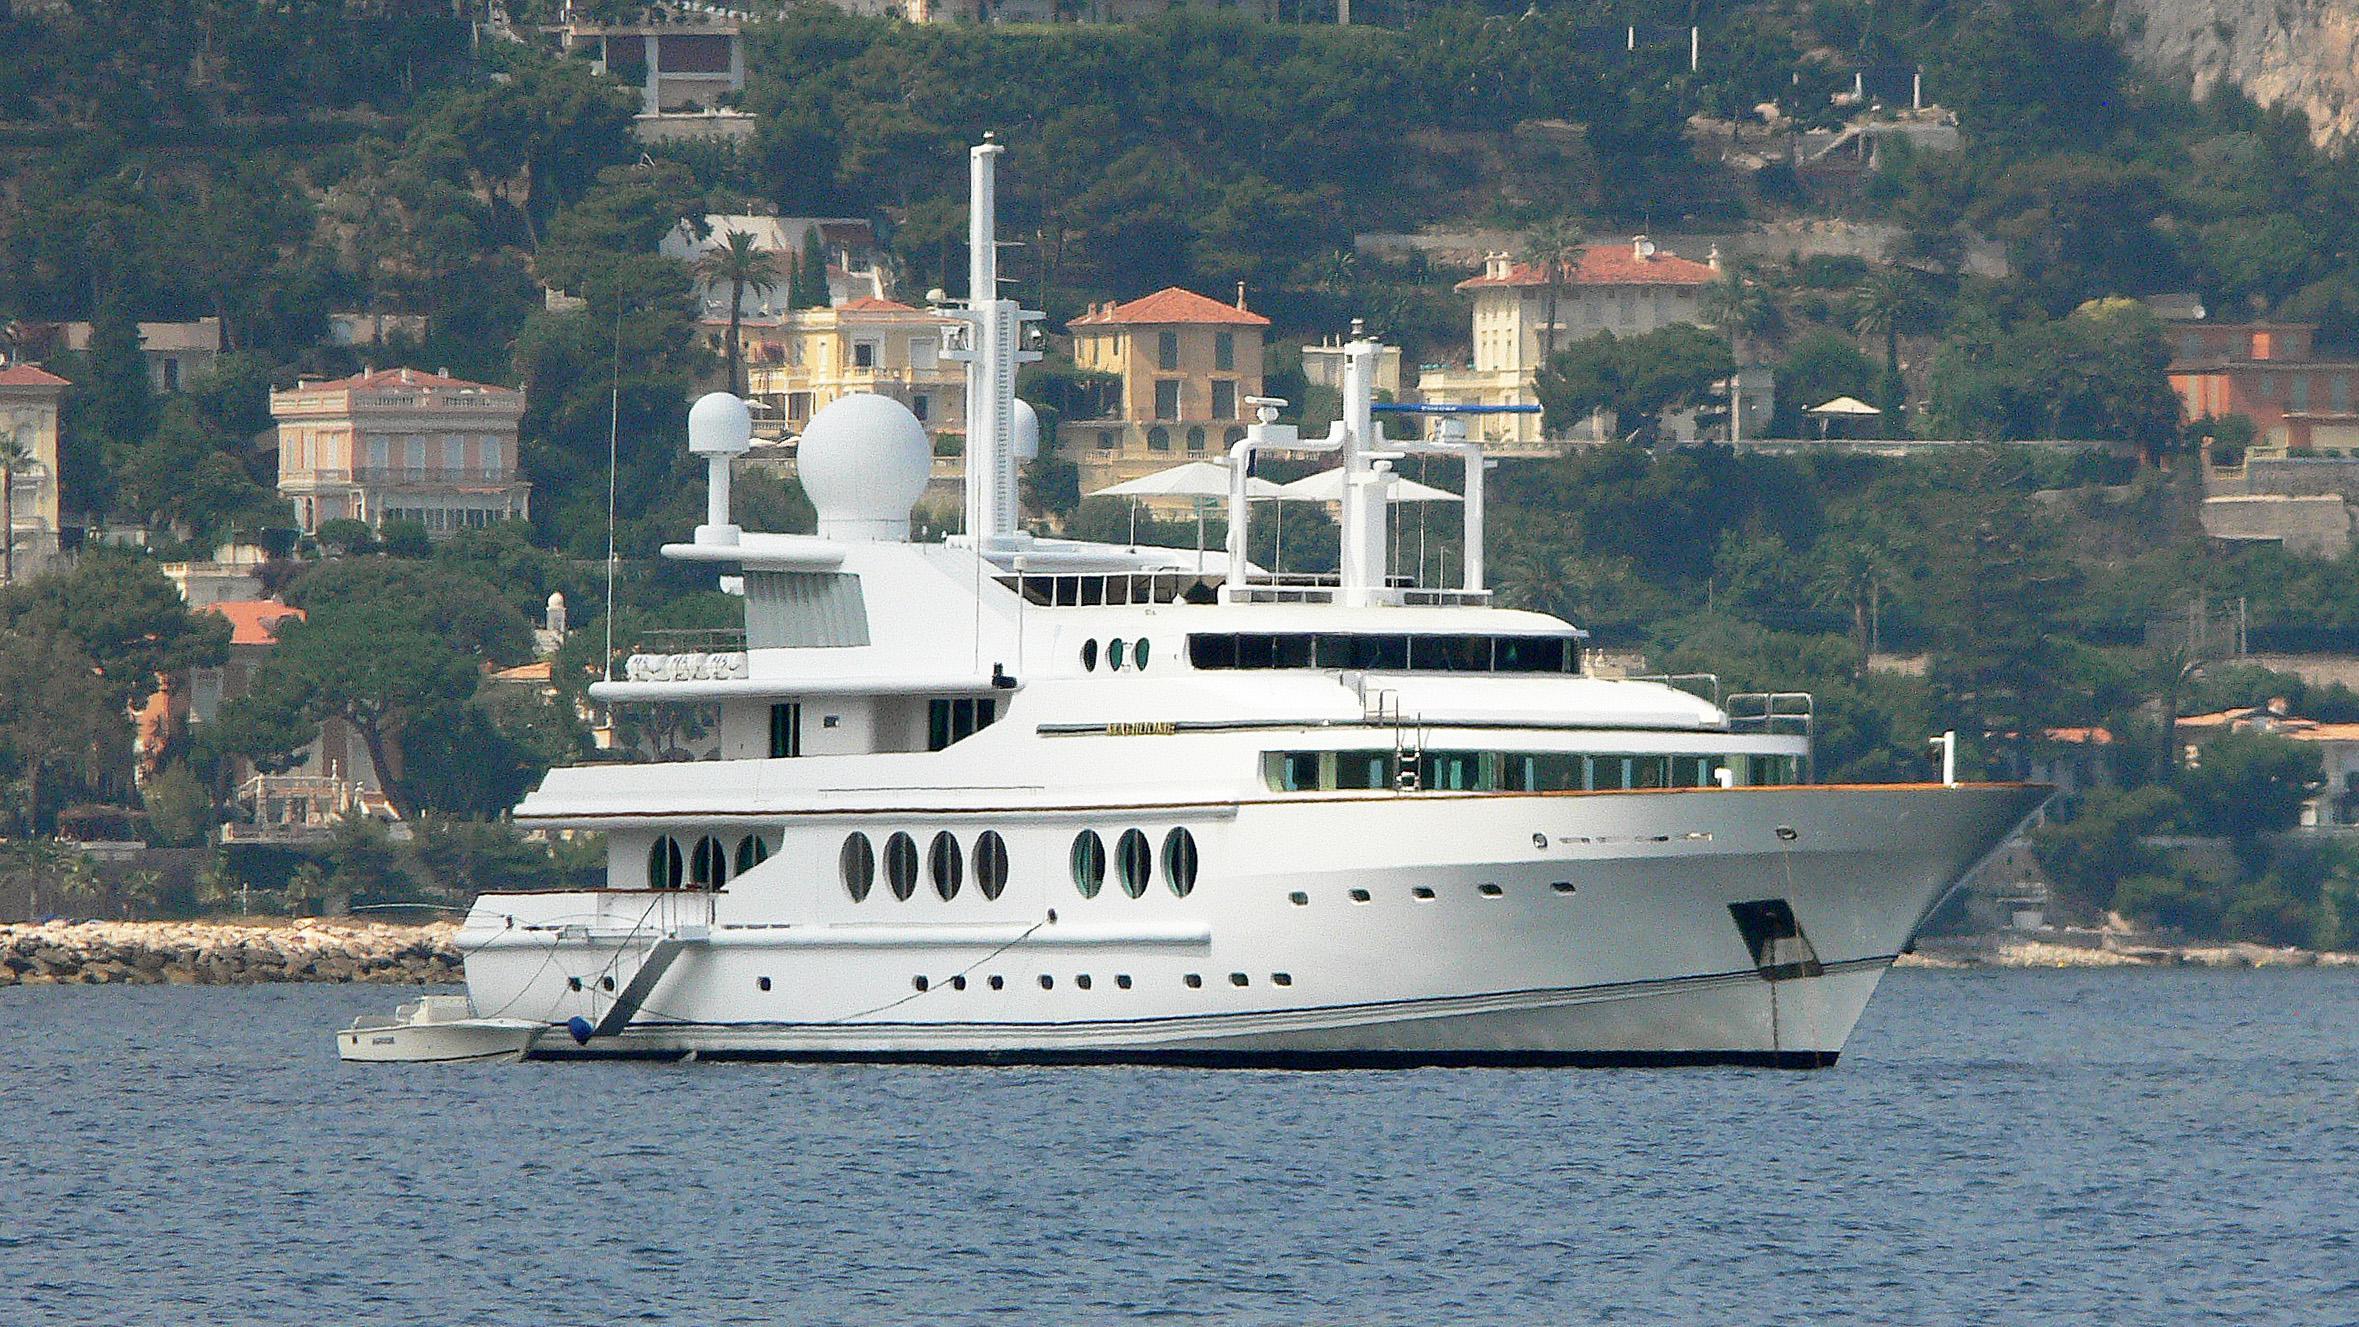 maridome-motor-yacht-brooke-1989-54m-half-profile